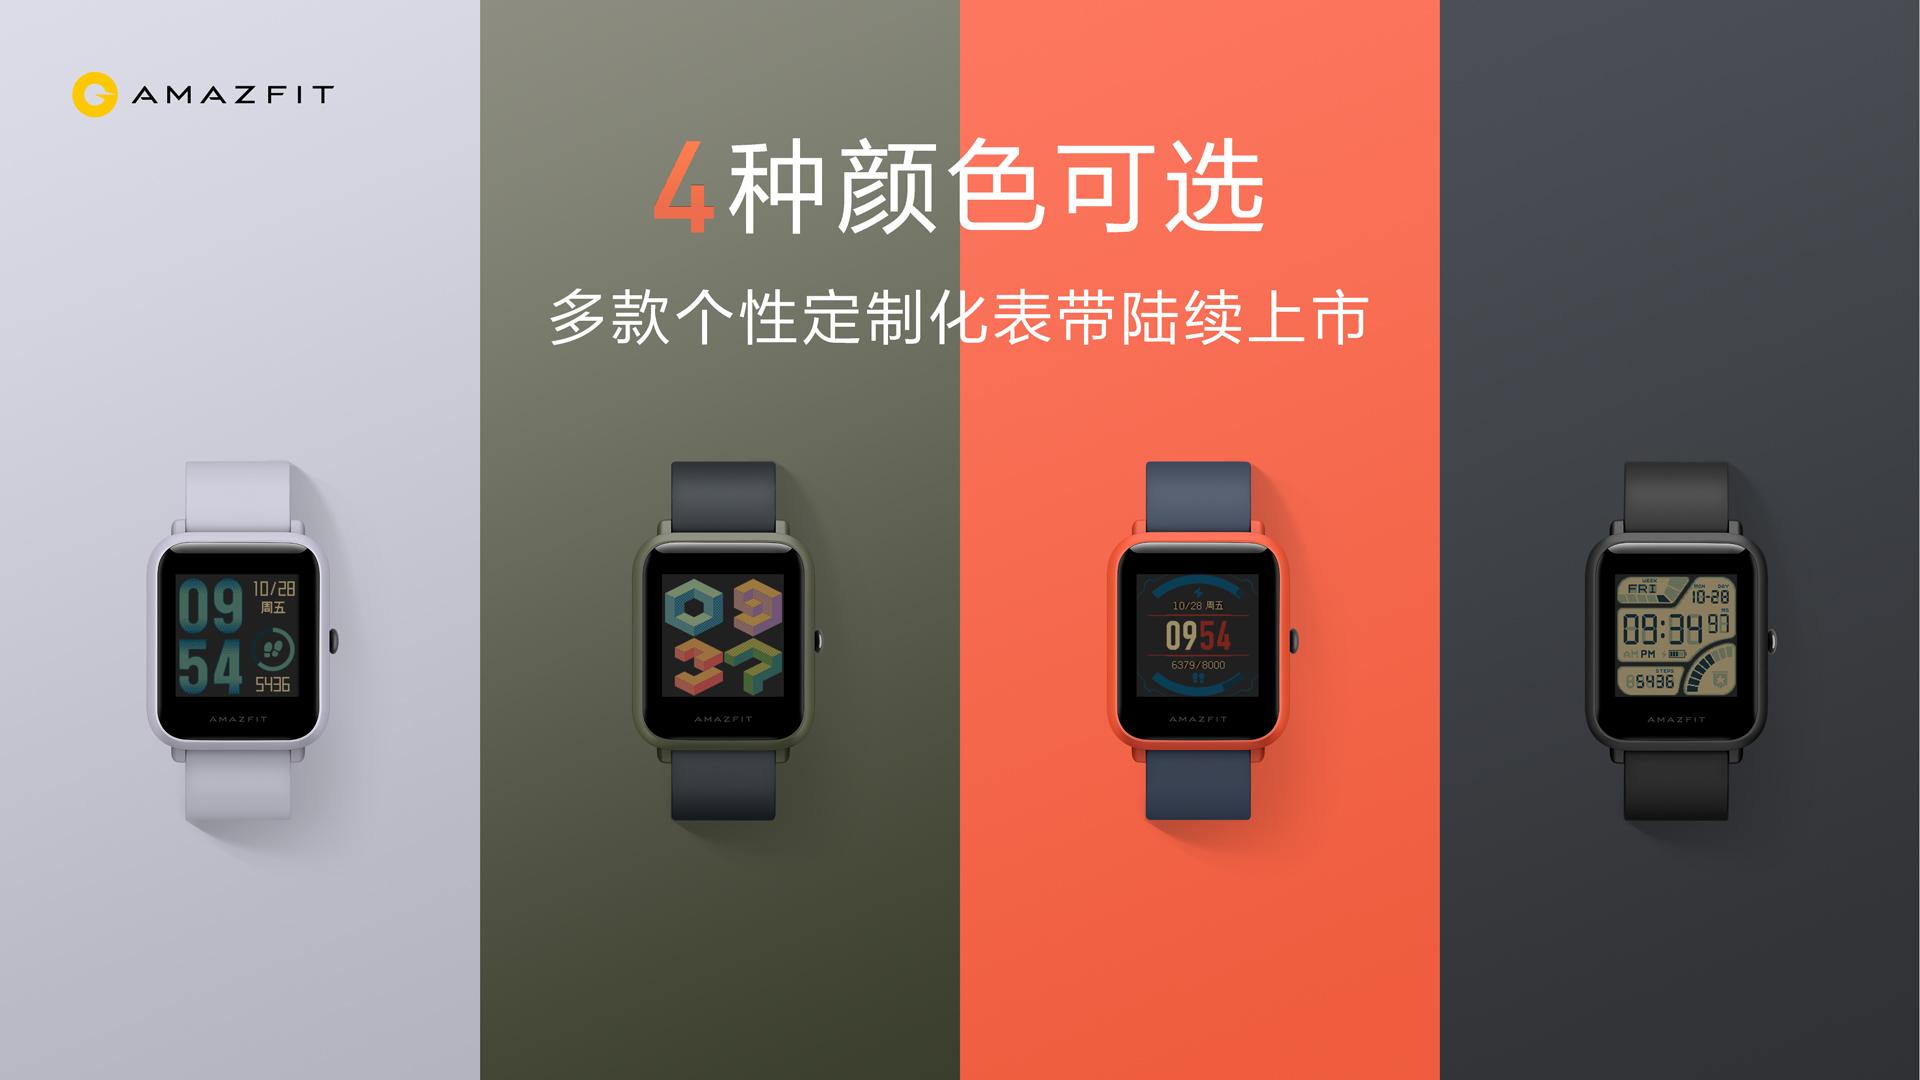 Obrovská sleva na originální hodinky Xiaomi Huami Amazfit Bip! [sponzorovaný článek]